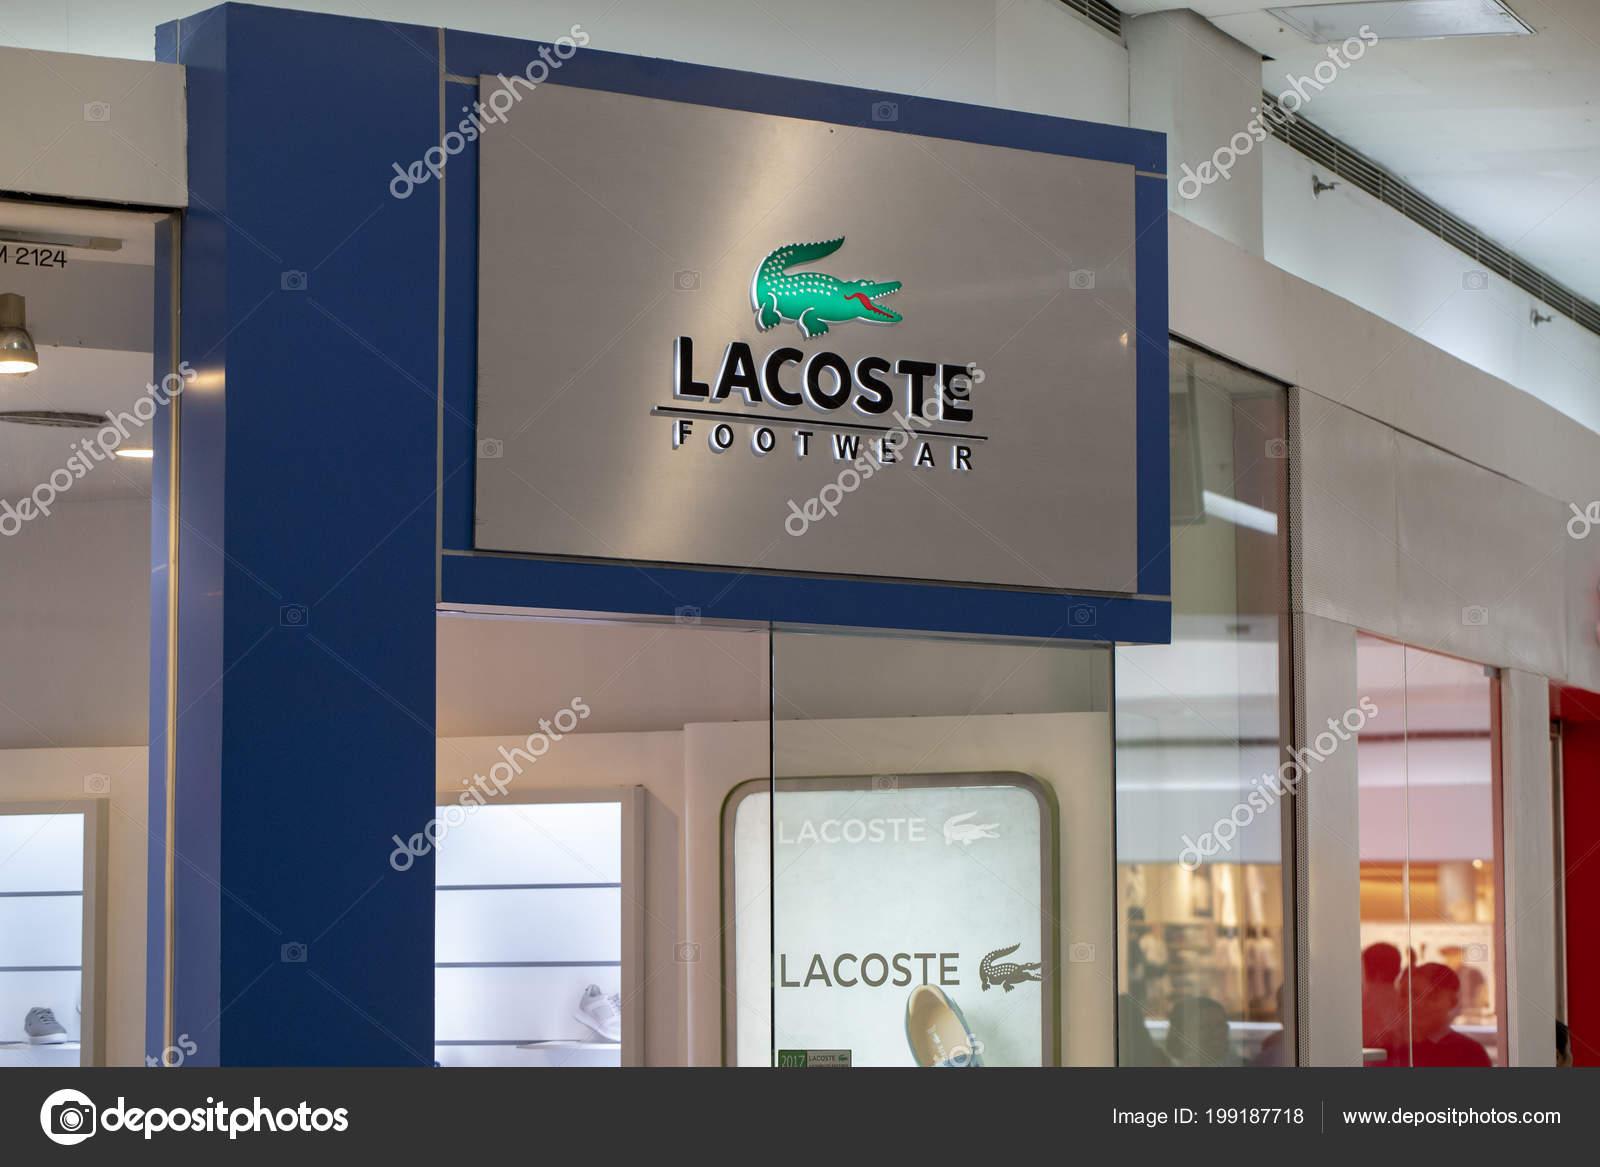 0551e27c7 Manila Philippines March 2018 Lacoste Brand Name Storefront Mall ...